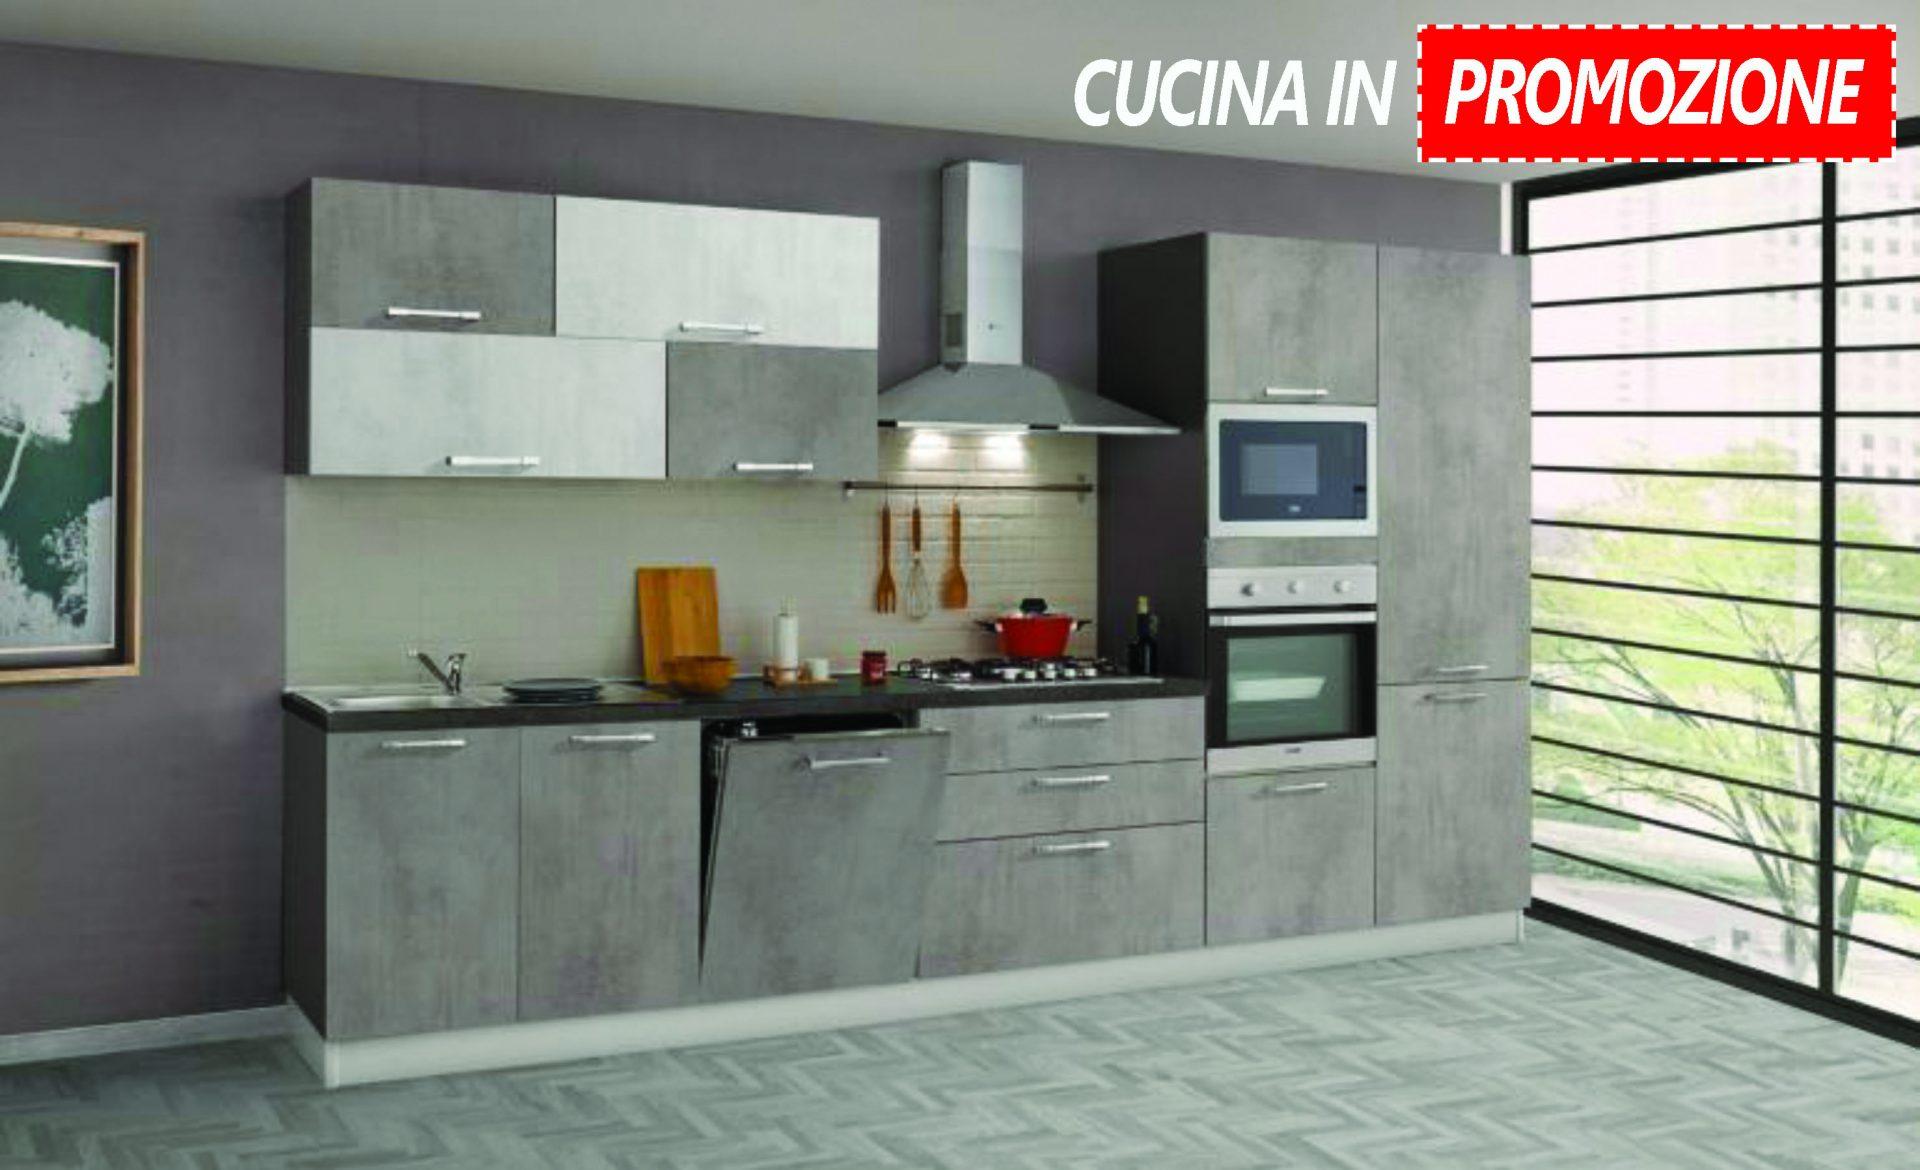 CUCINA 1 PROMO